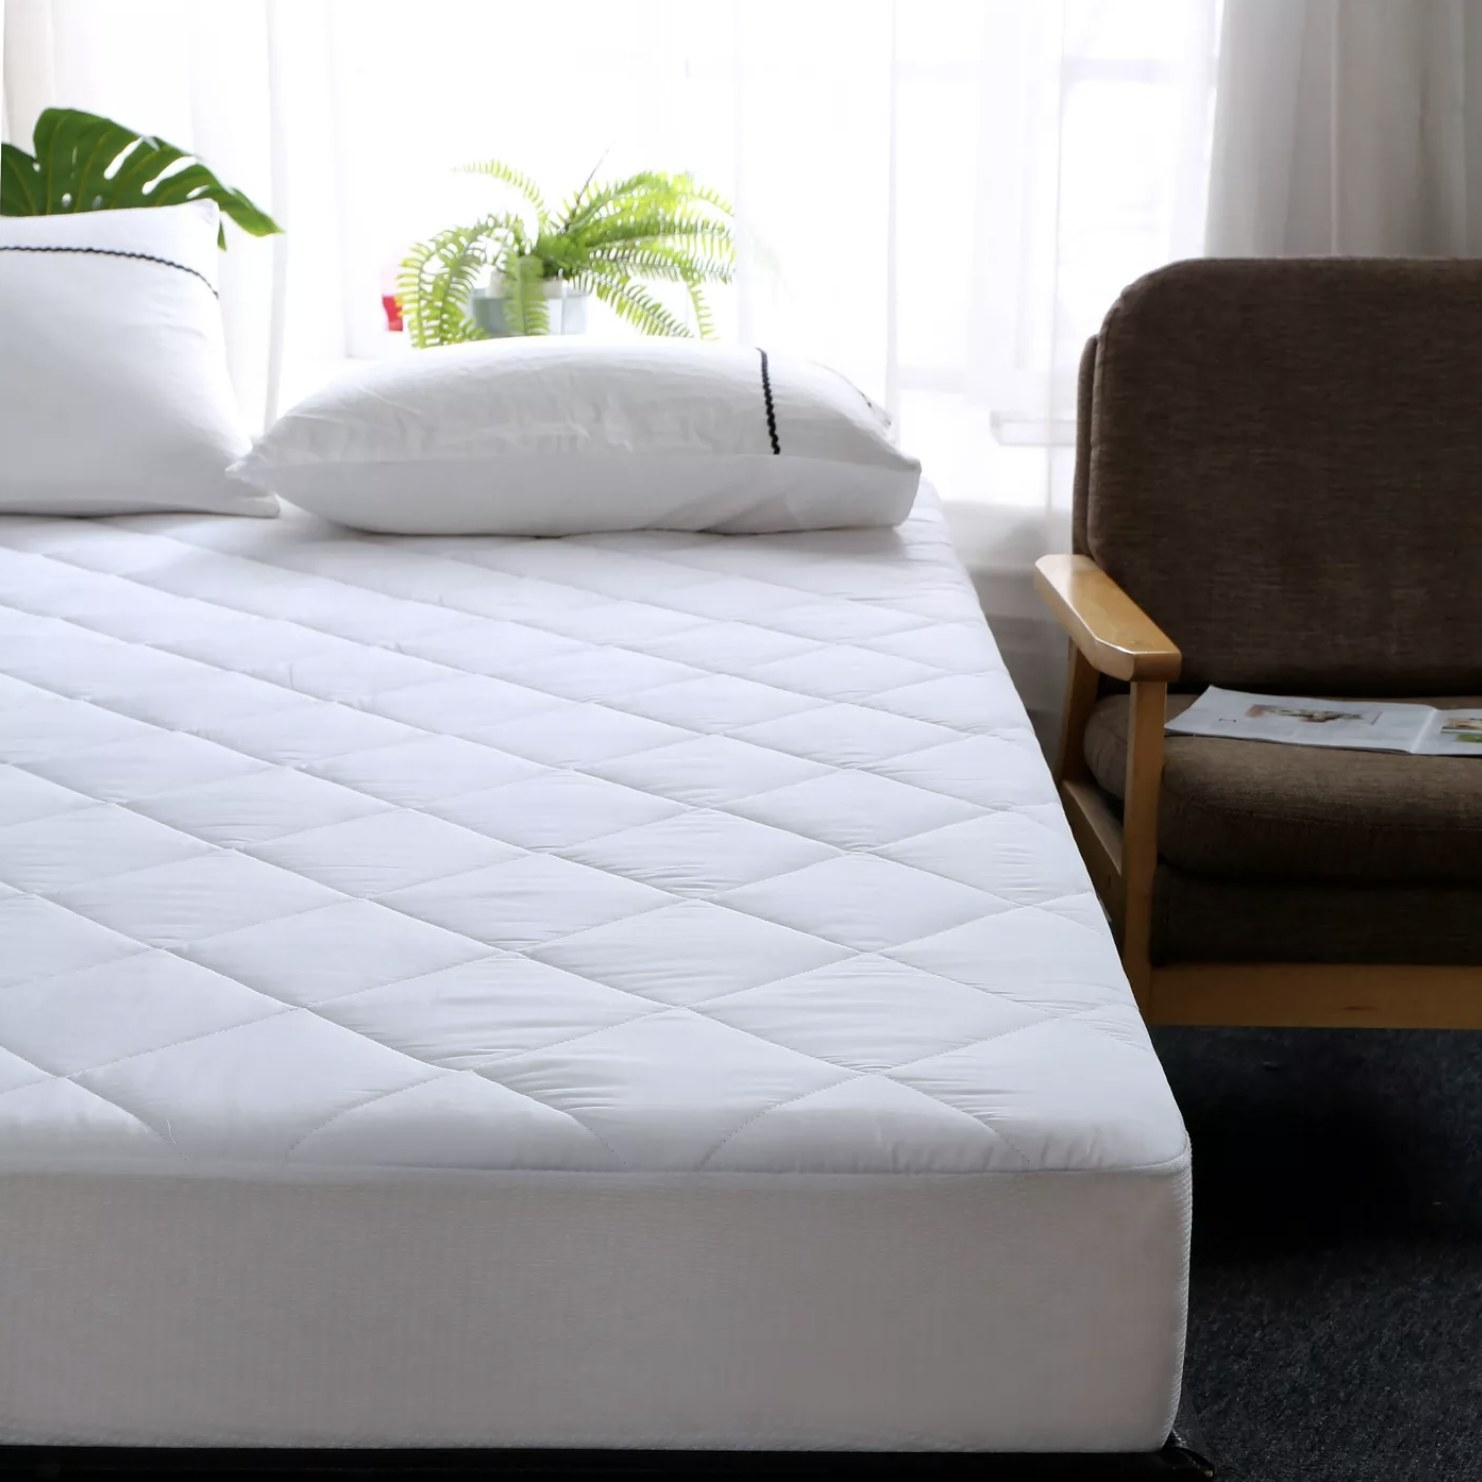 The mattress pad on a mattress